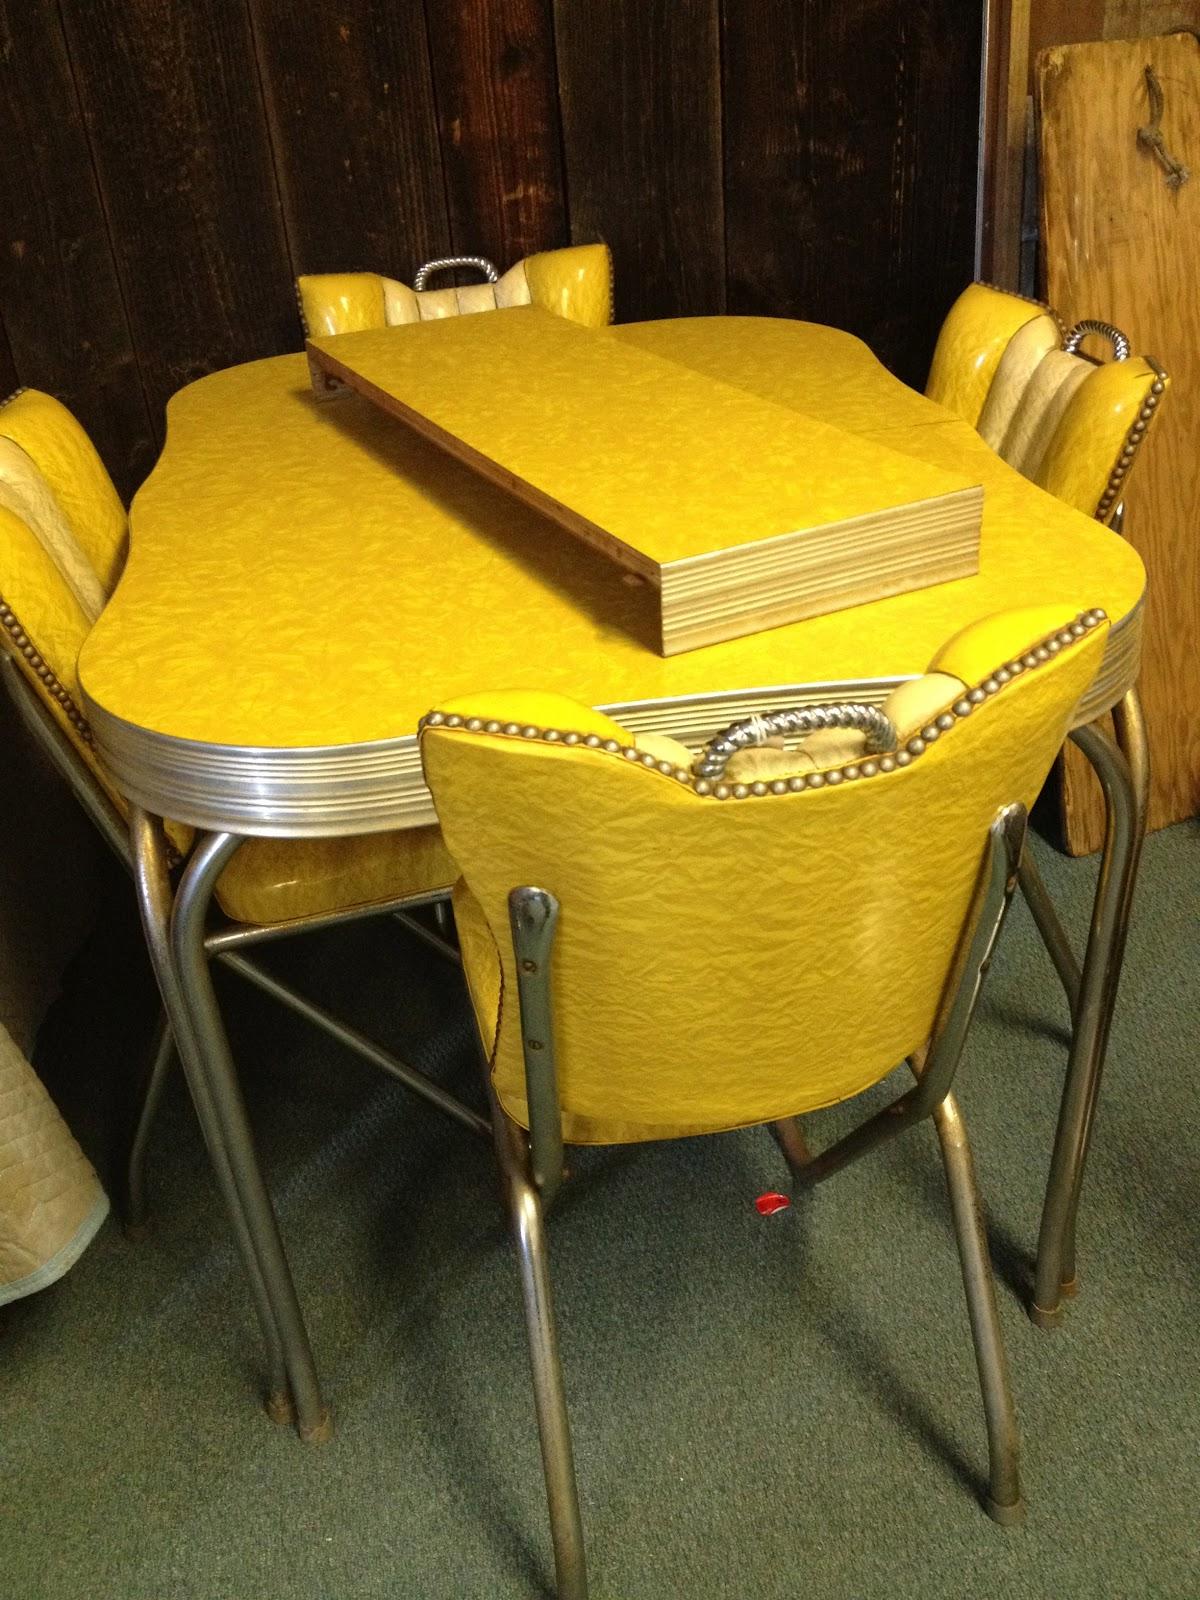 vintage kitchen table formica photo - 5